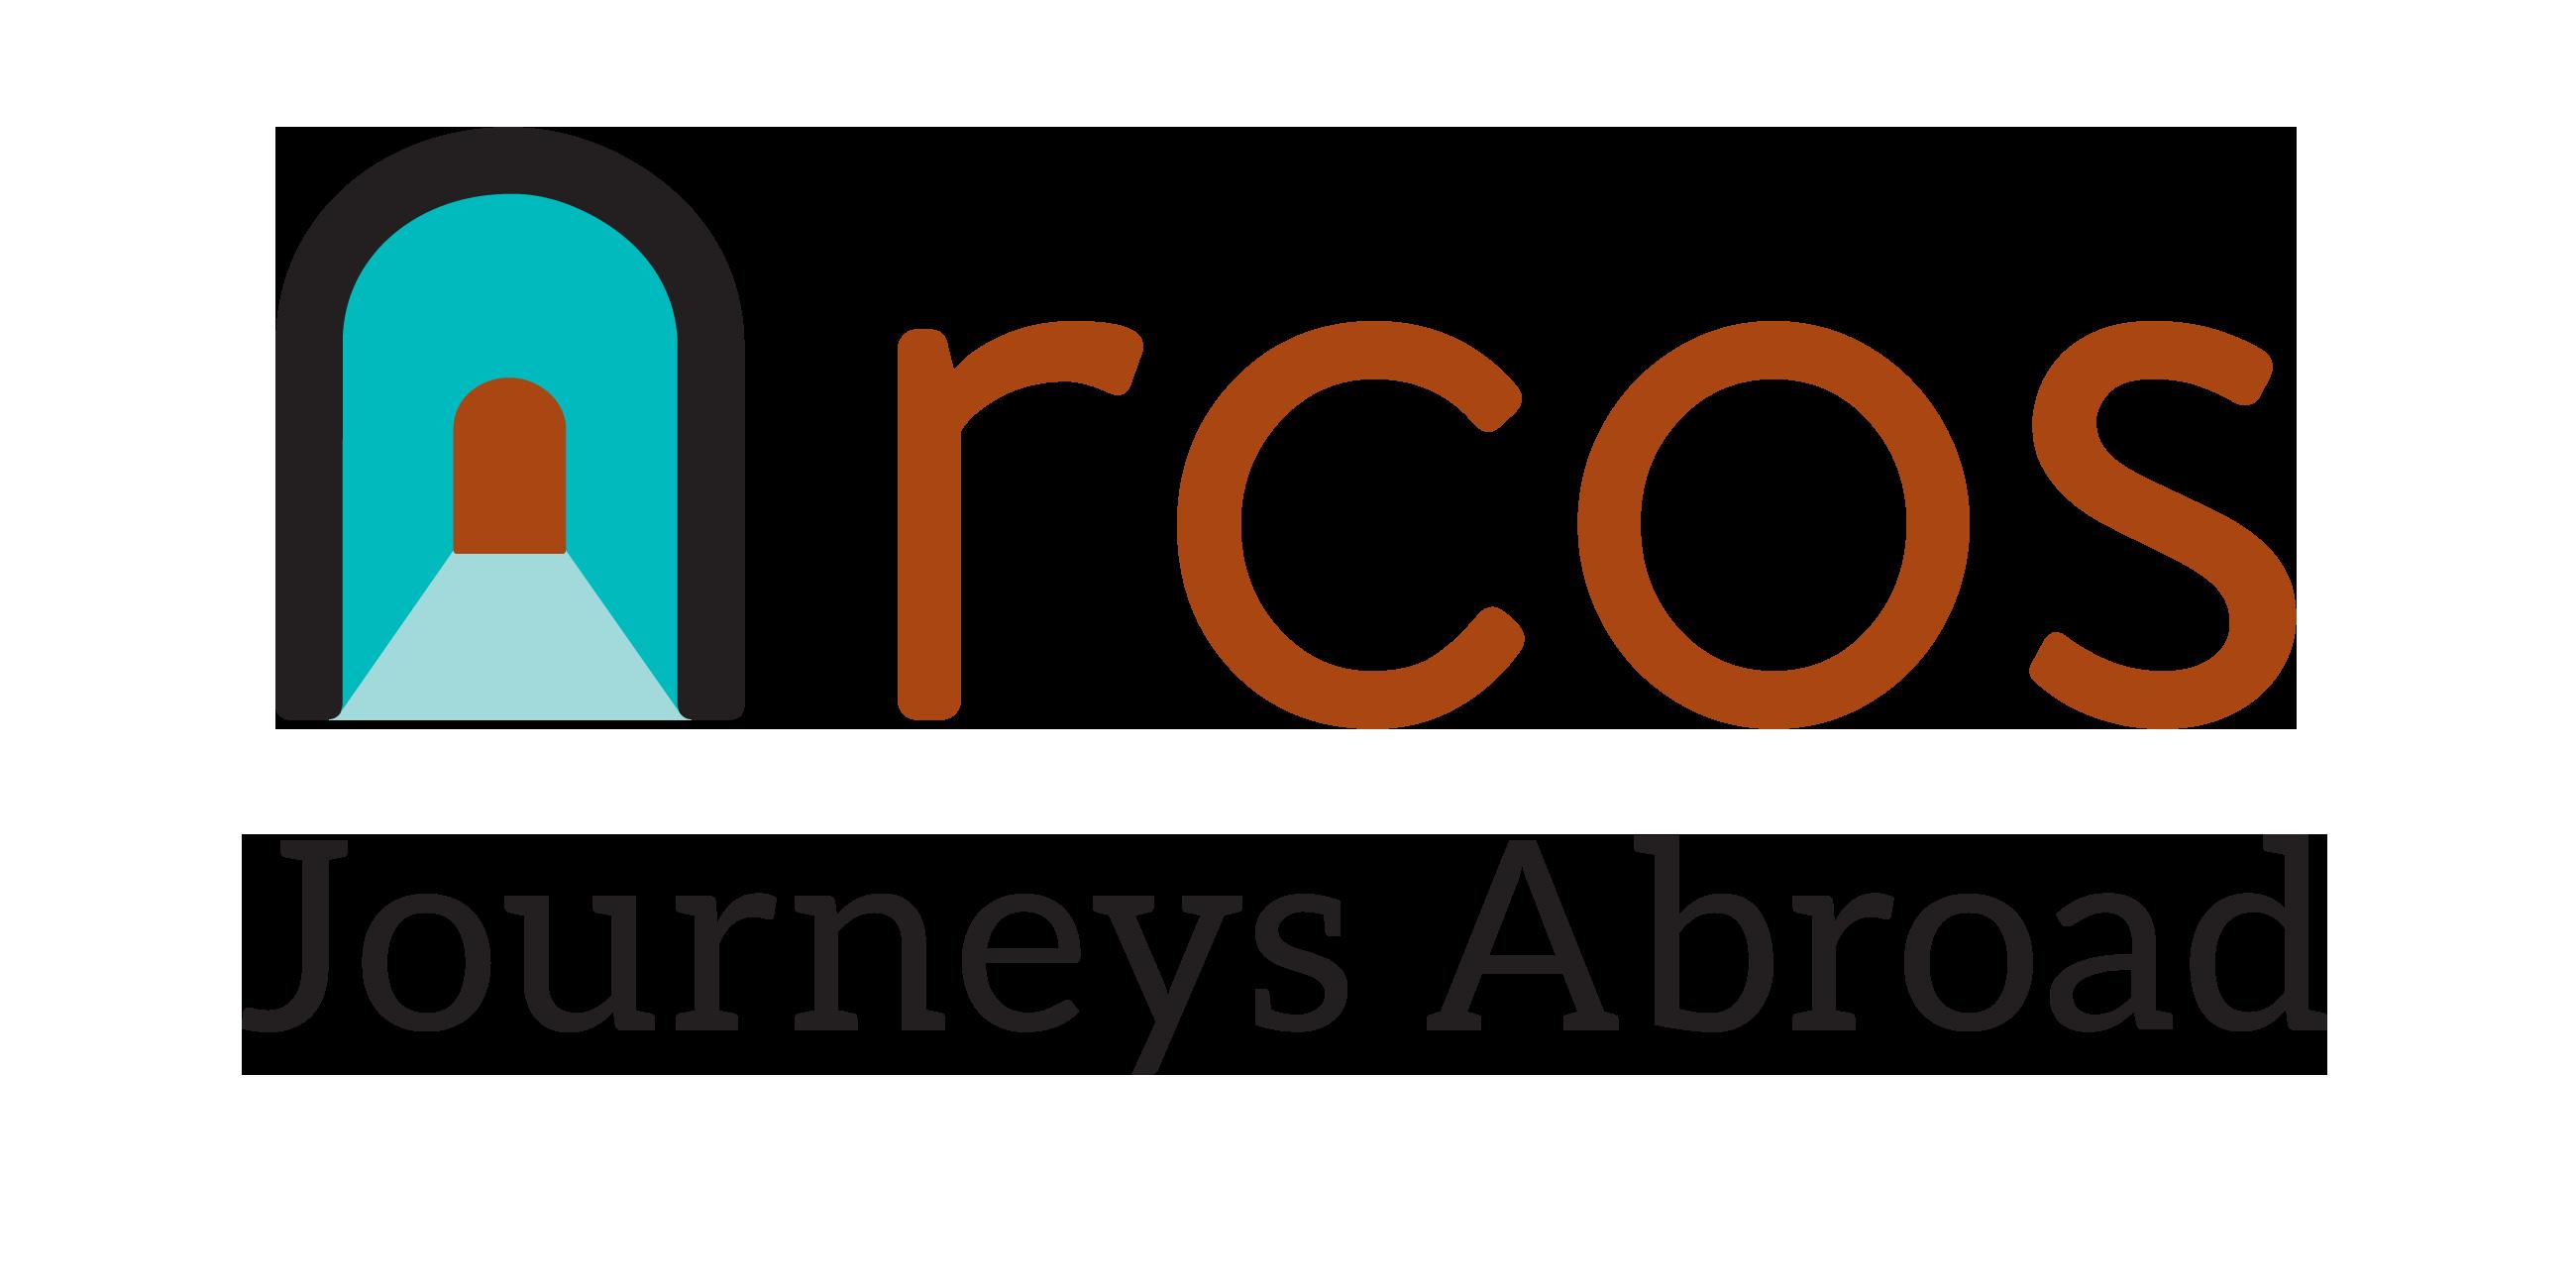 Summer Program Arcos Journeys: High School Study Abroad